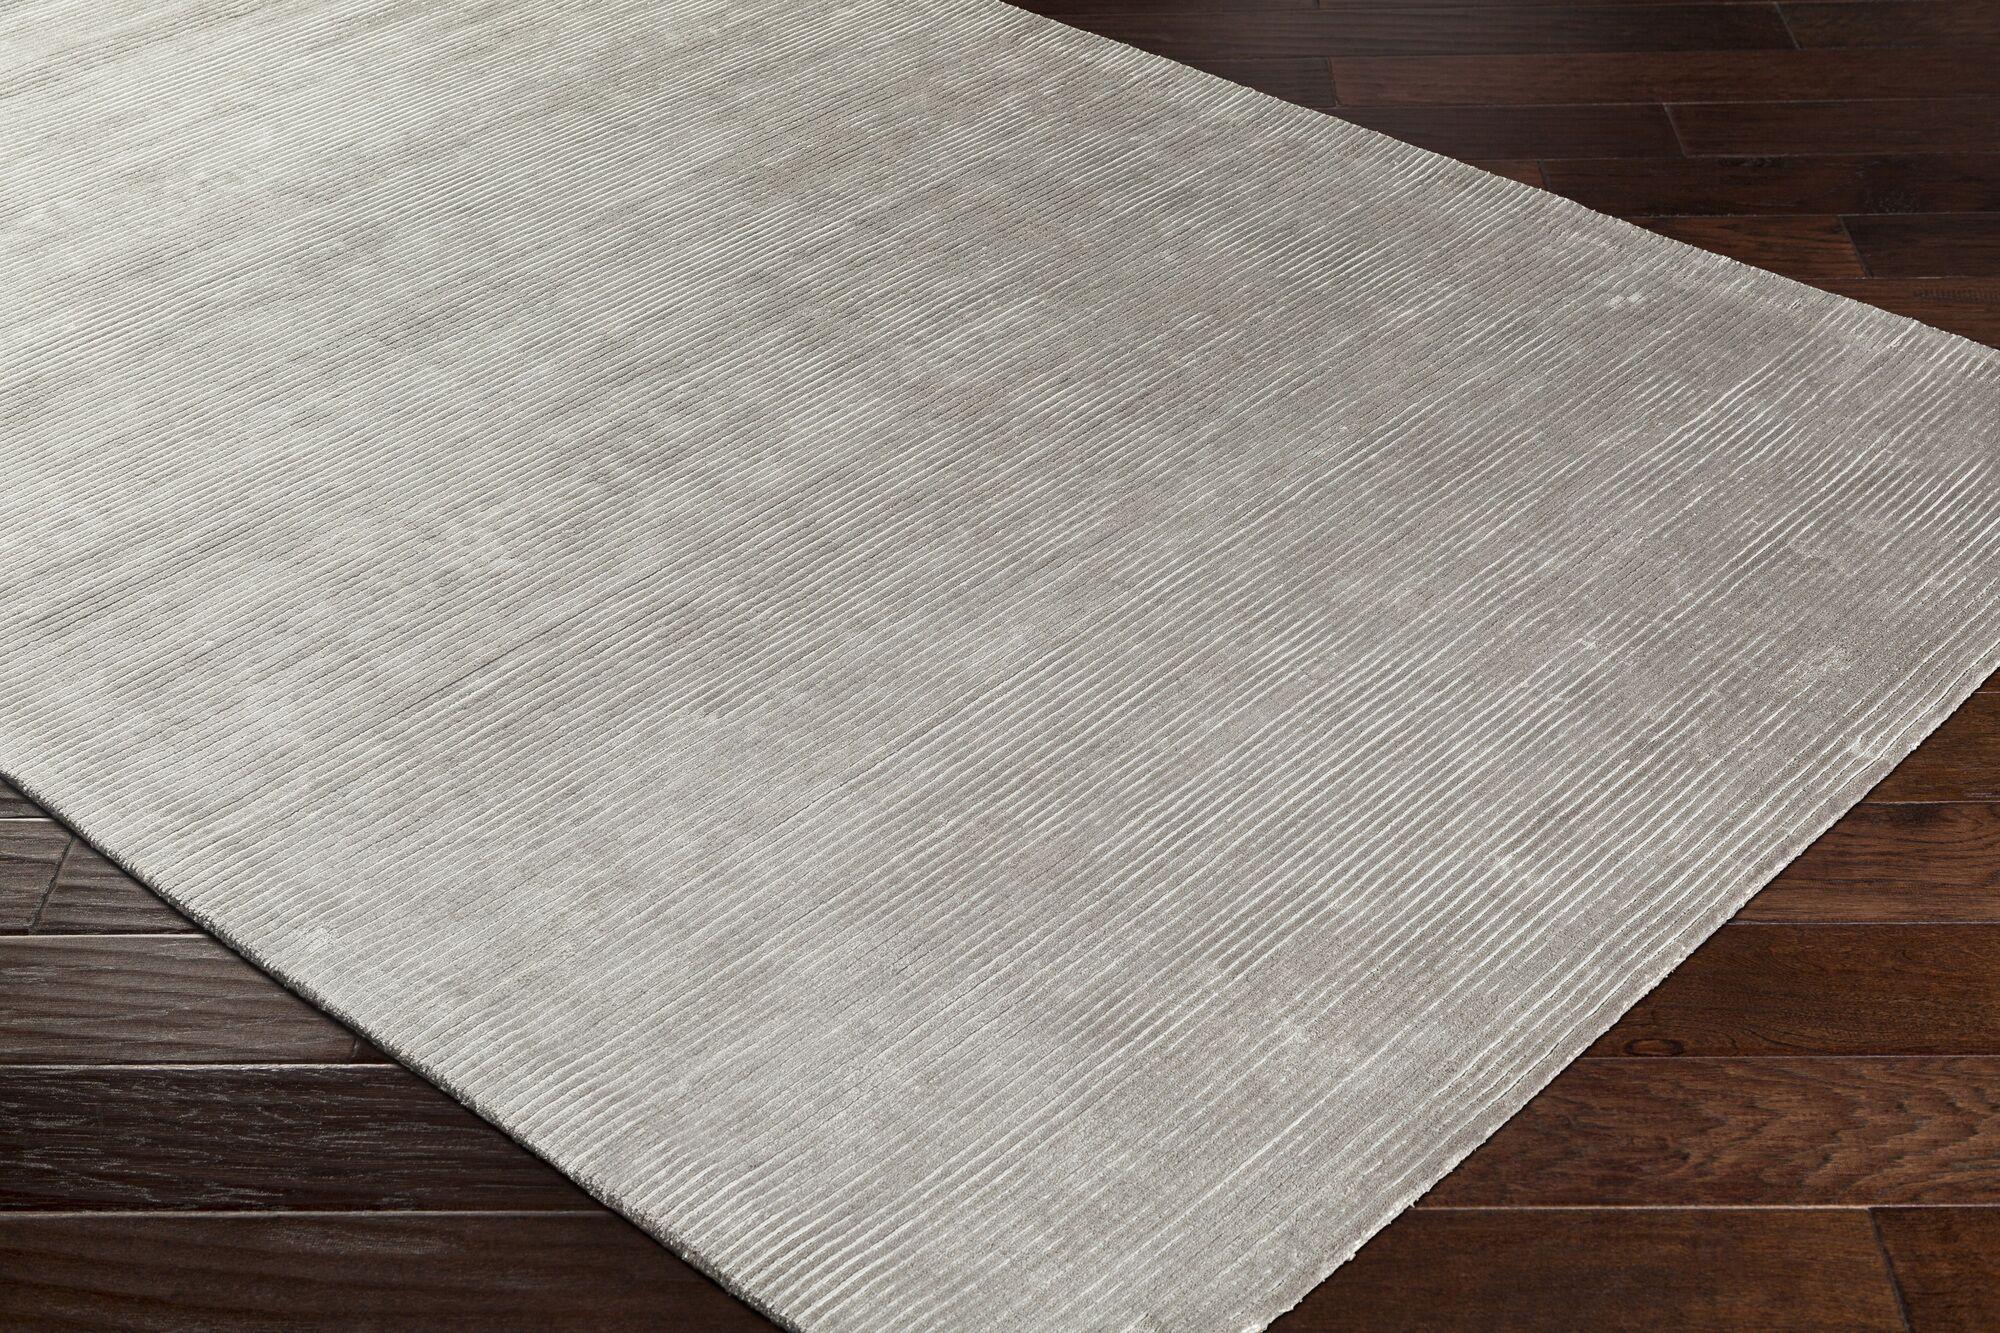 Aurora Hand Woven Medium Gray Area Rug Rug Size: Rectangle 2' x 3'